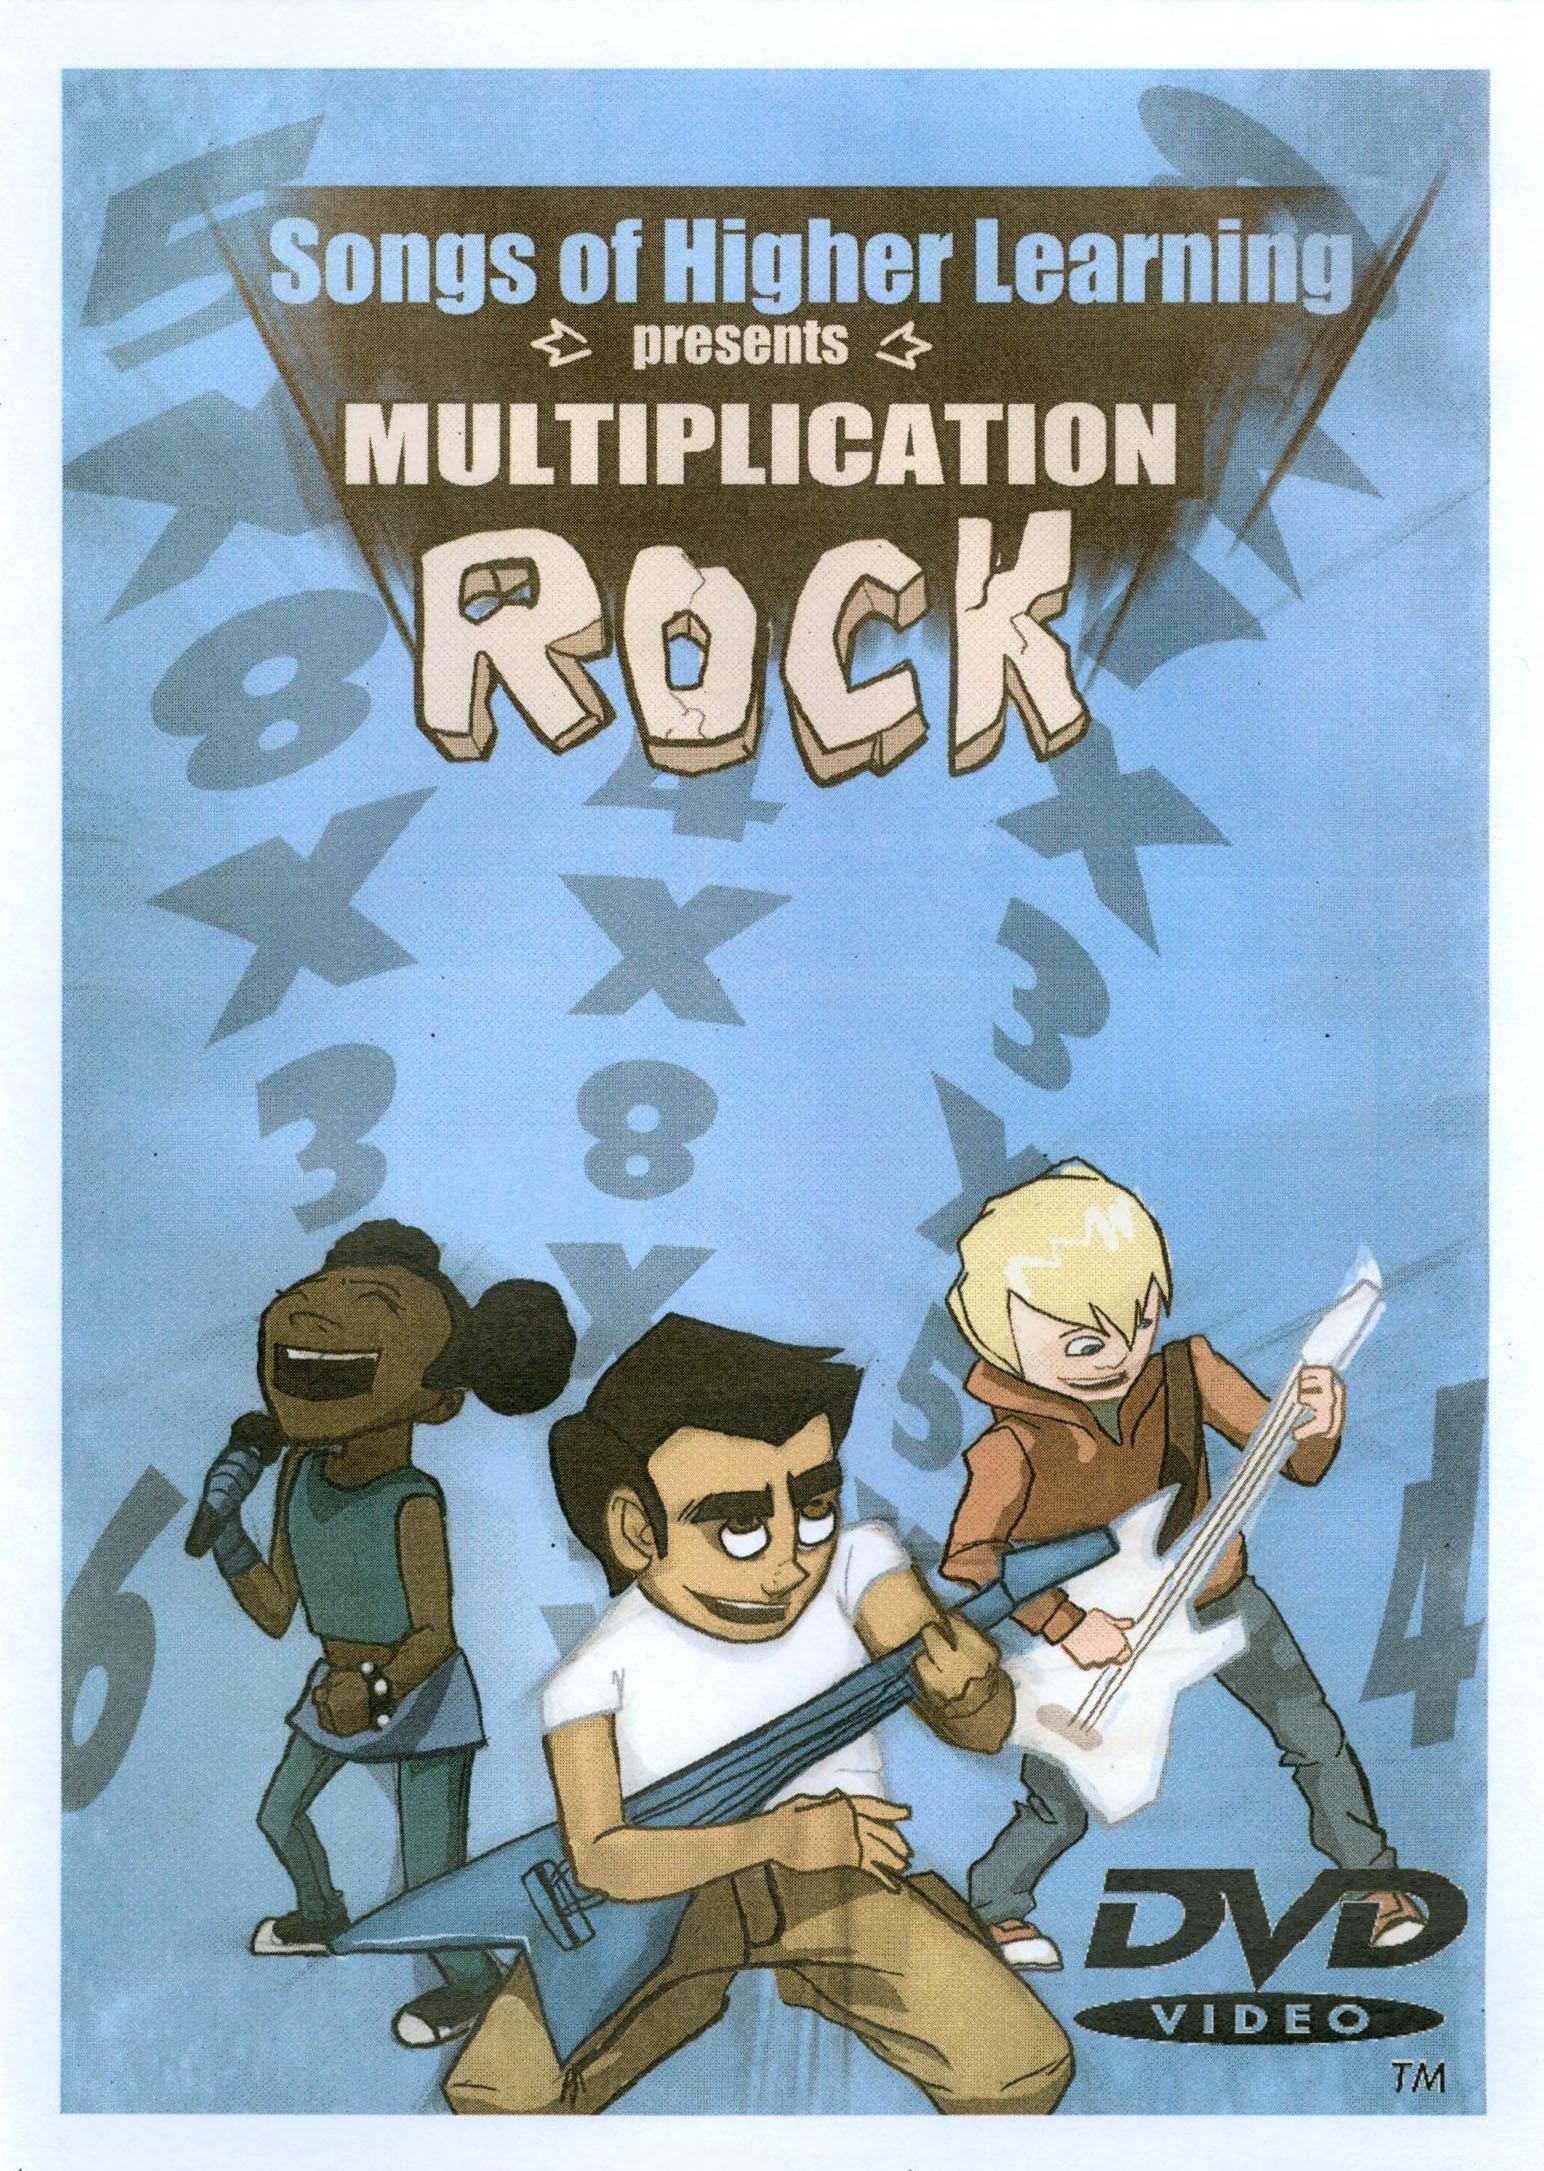 Songs of Higher Learning: Multiplication Rock